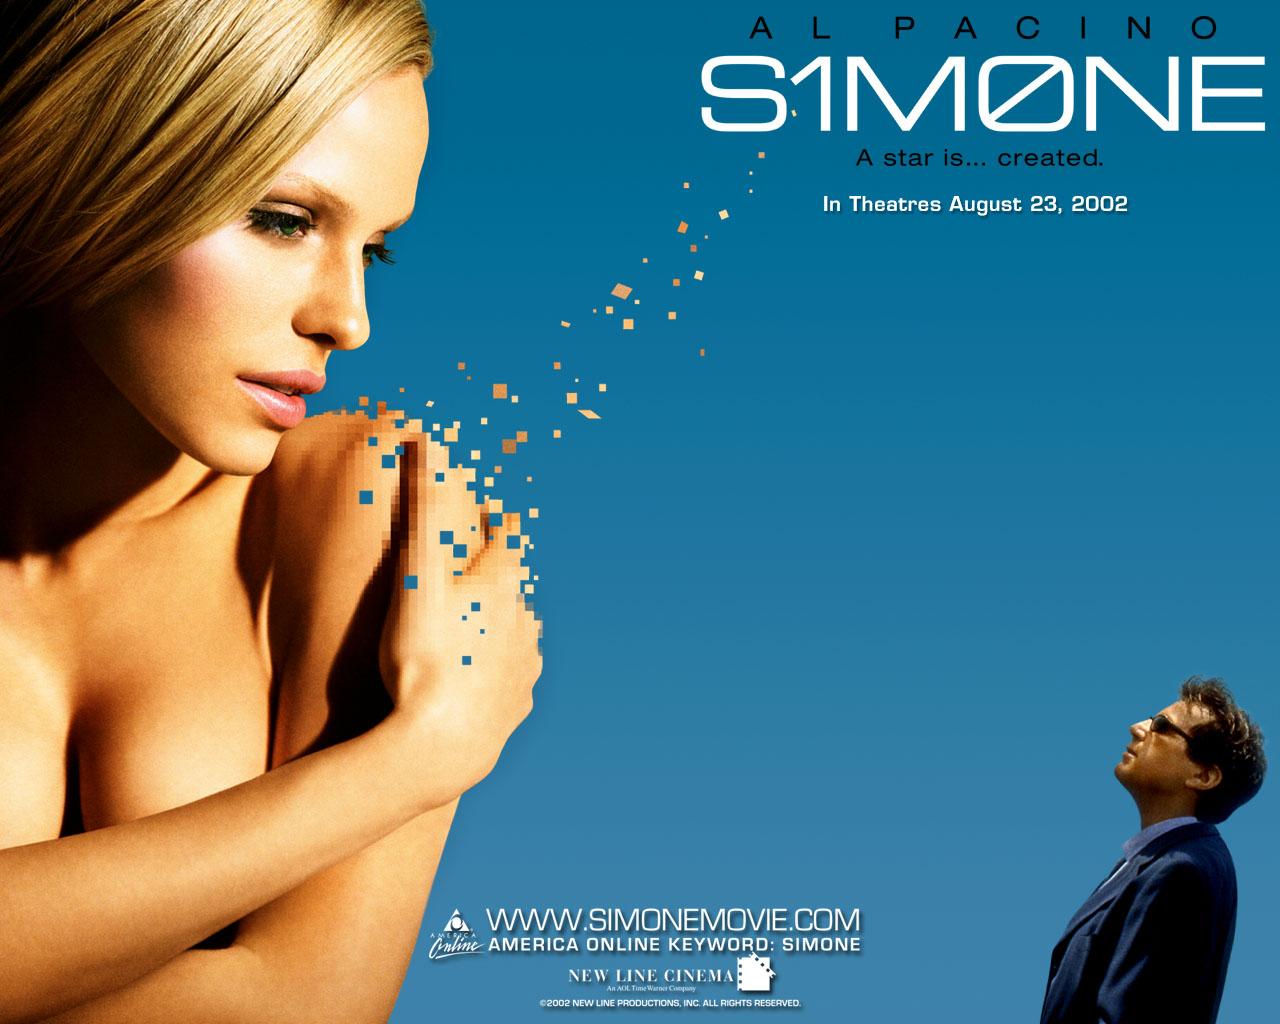 http://3.bp.blogspot.com/_9gXs8u-9PxU/TGygKLtgc6I/AAAAAAAAACg/FNlWO2veqVk/s1600/S1m0ne_(Simone),_2002,_Al_Pacino,_Rachel_Roberts.jpg